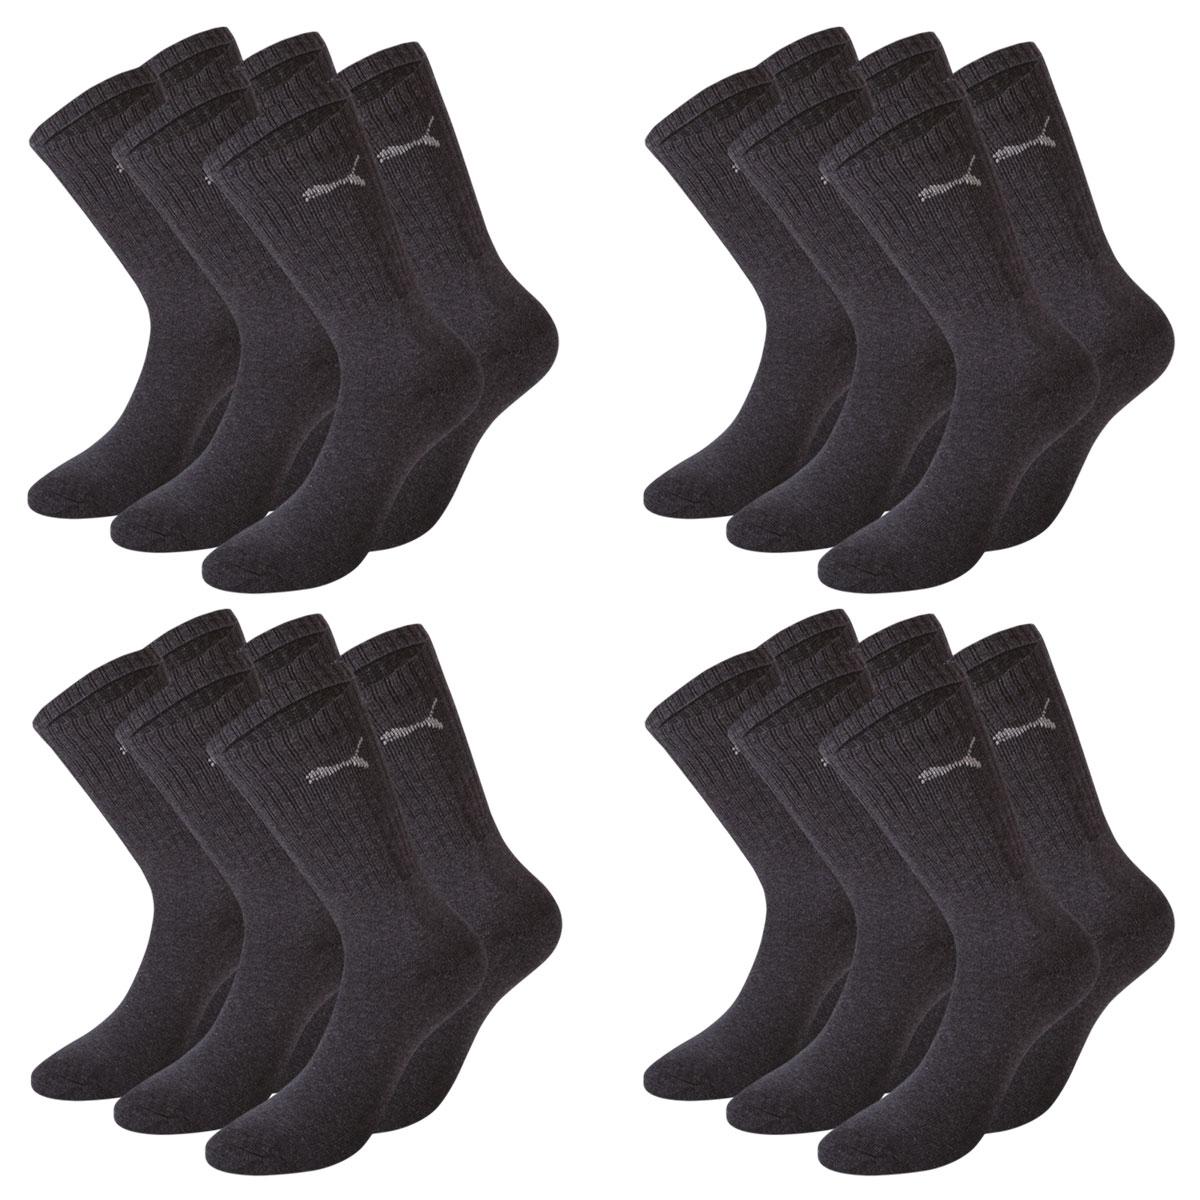 12 Paar Puma Socken, anthrazit